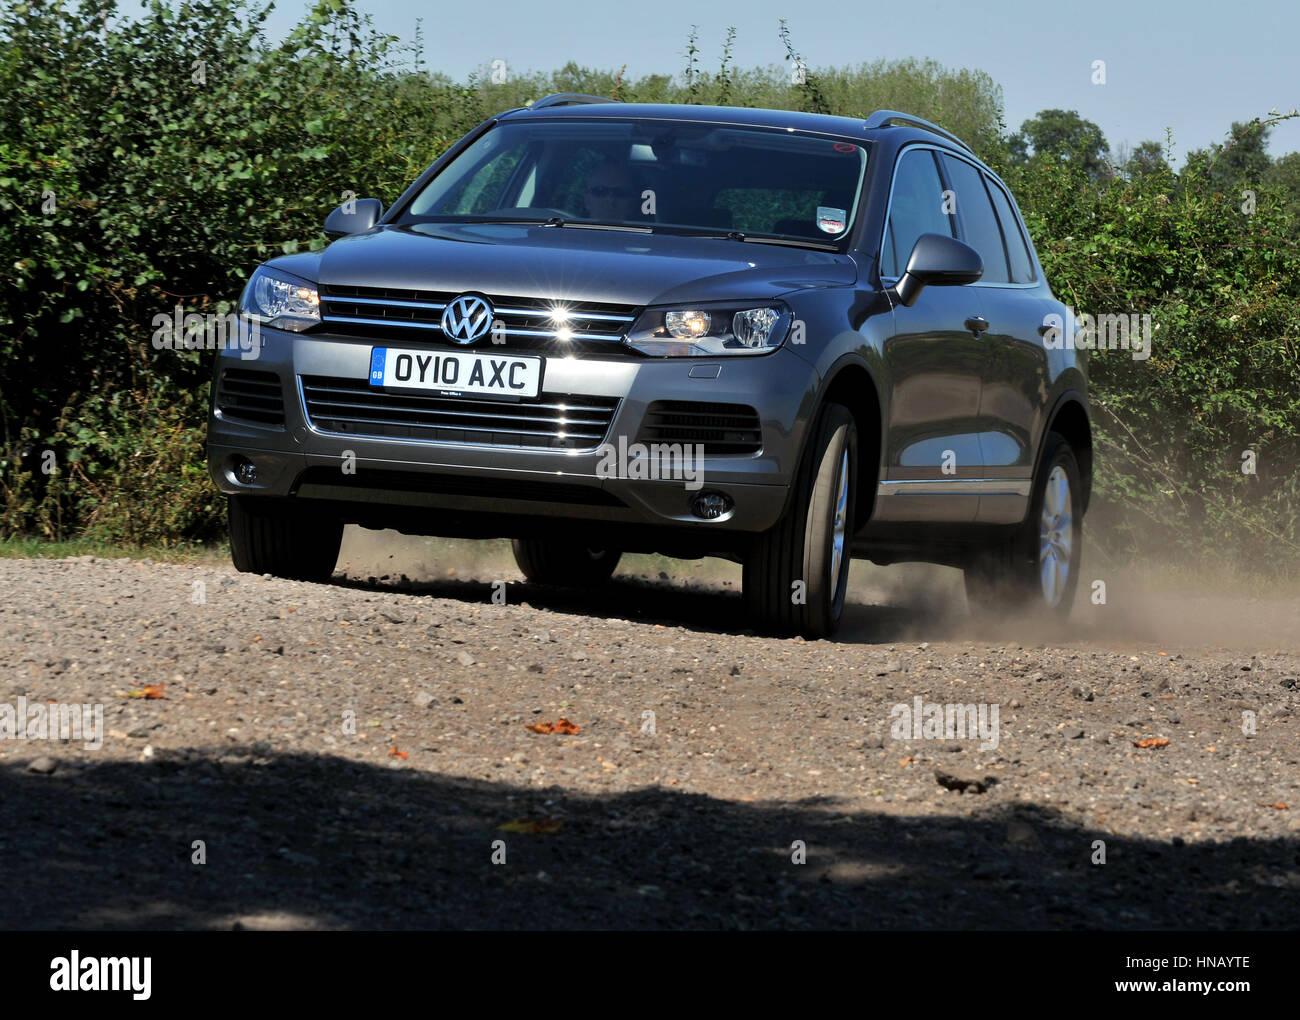 2010 VW Volkswagen Toureg SUV - Stock Image